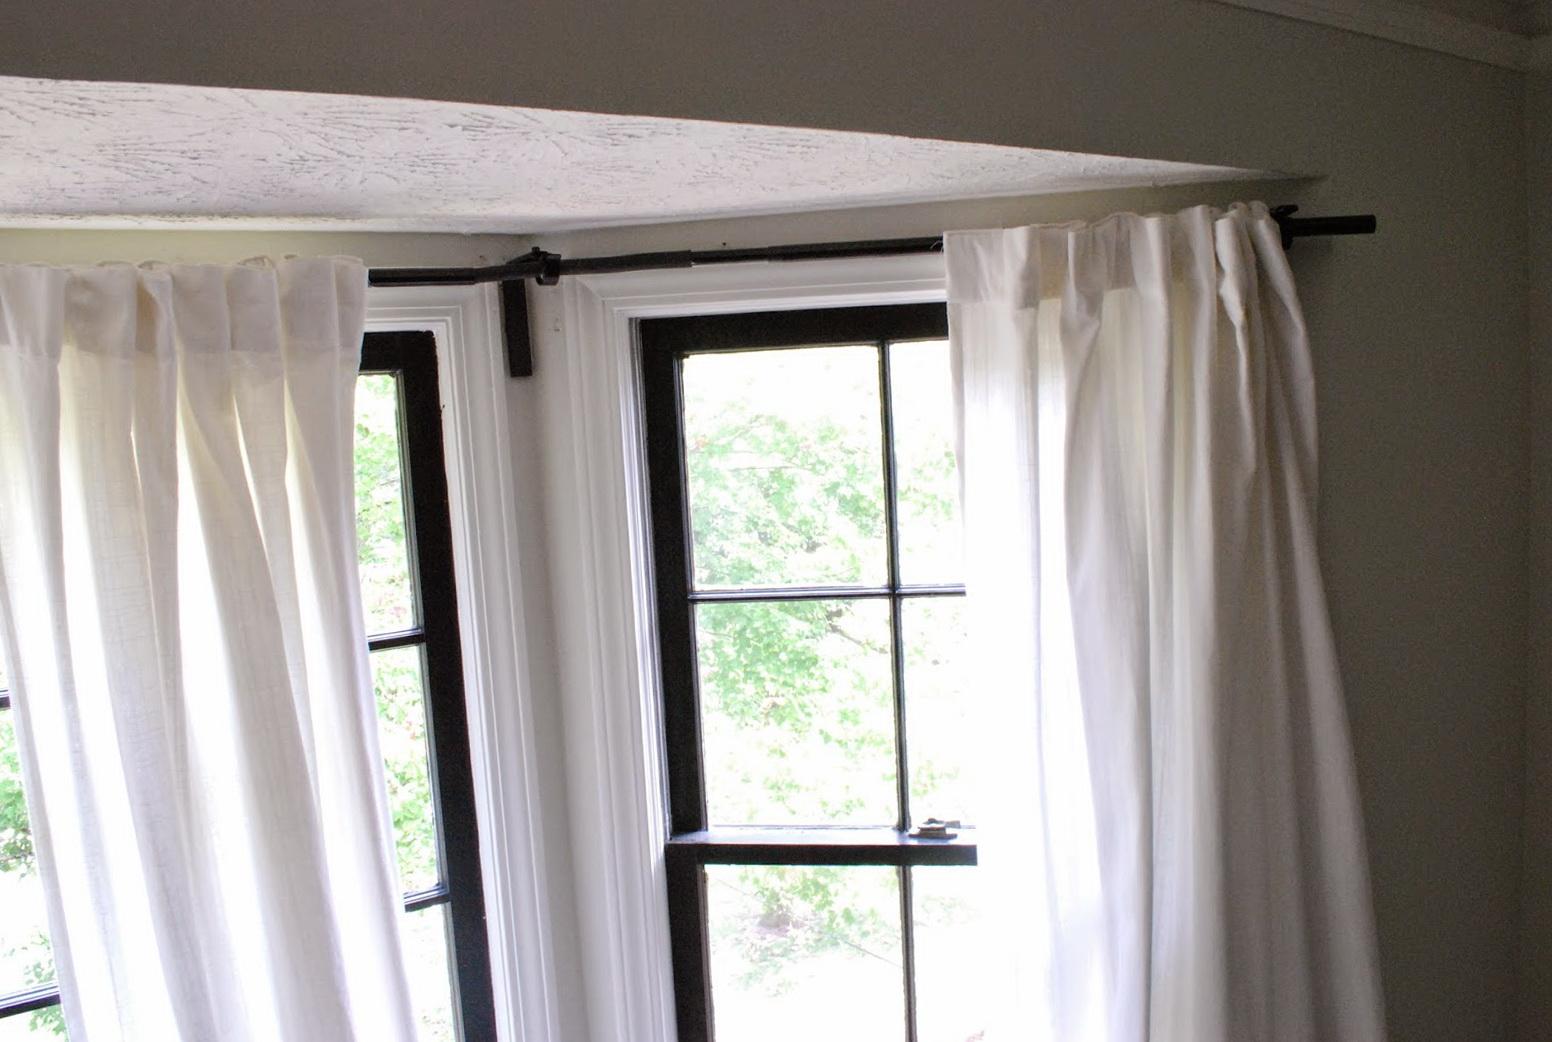 Curtain Rods For Bay Windows Ikea Home Design Ideas